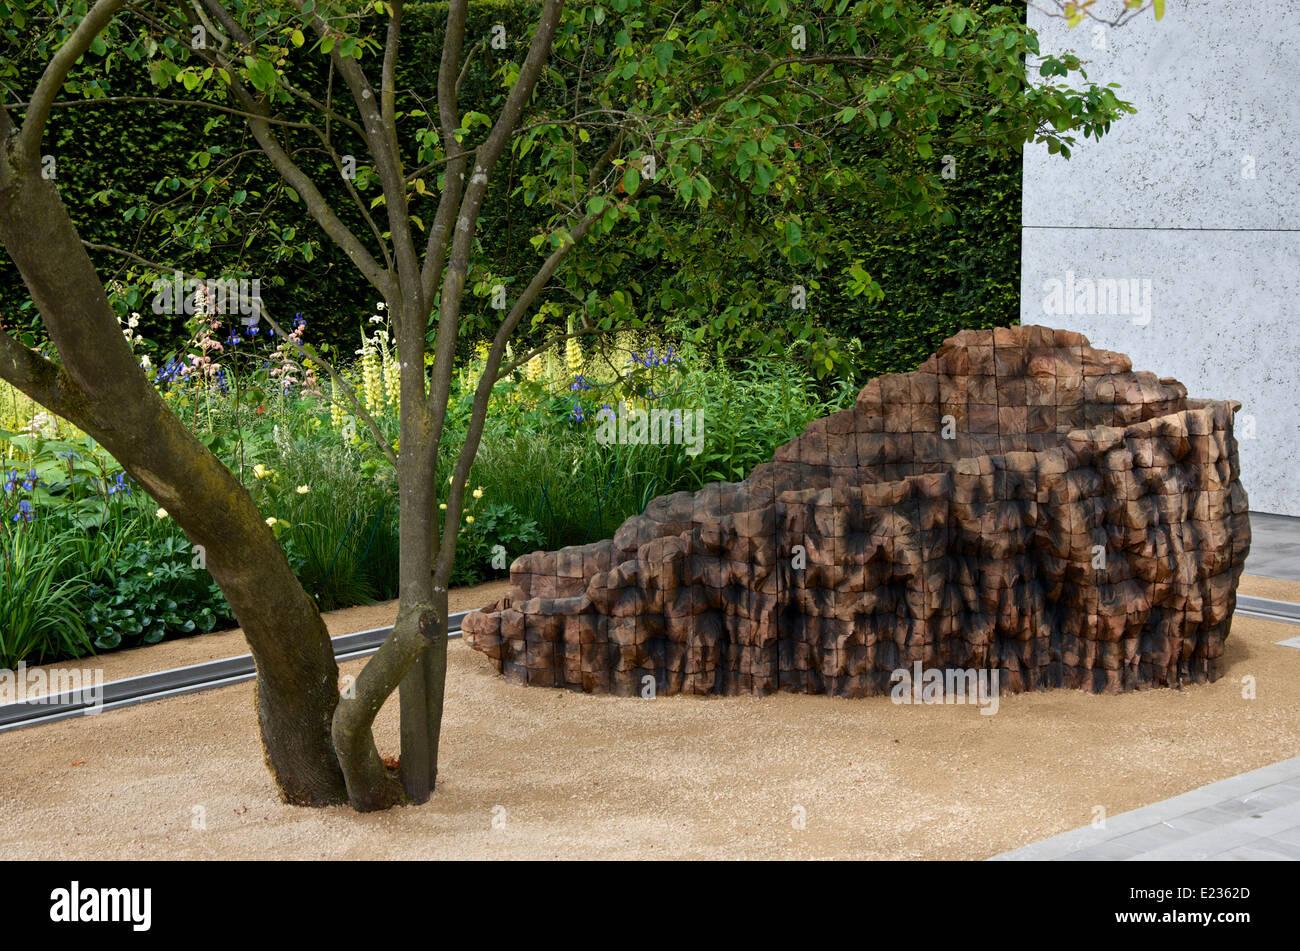 Cedar beam by artist Ursula von Rydingsvard in The Laurent-Perrier Garden at RHS Chelsea Flower Show 2014. - Stock Image